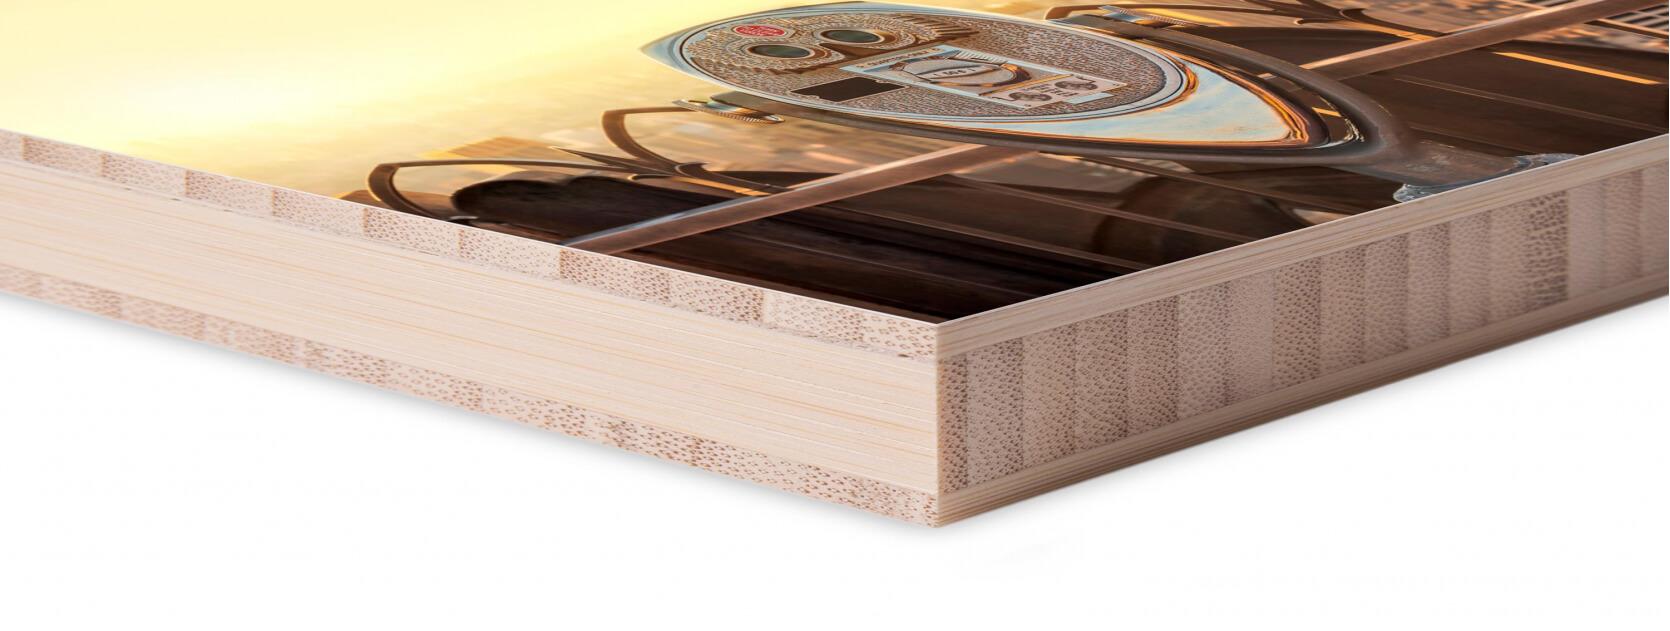 hoek foto op hout mat